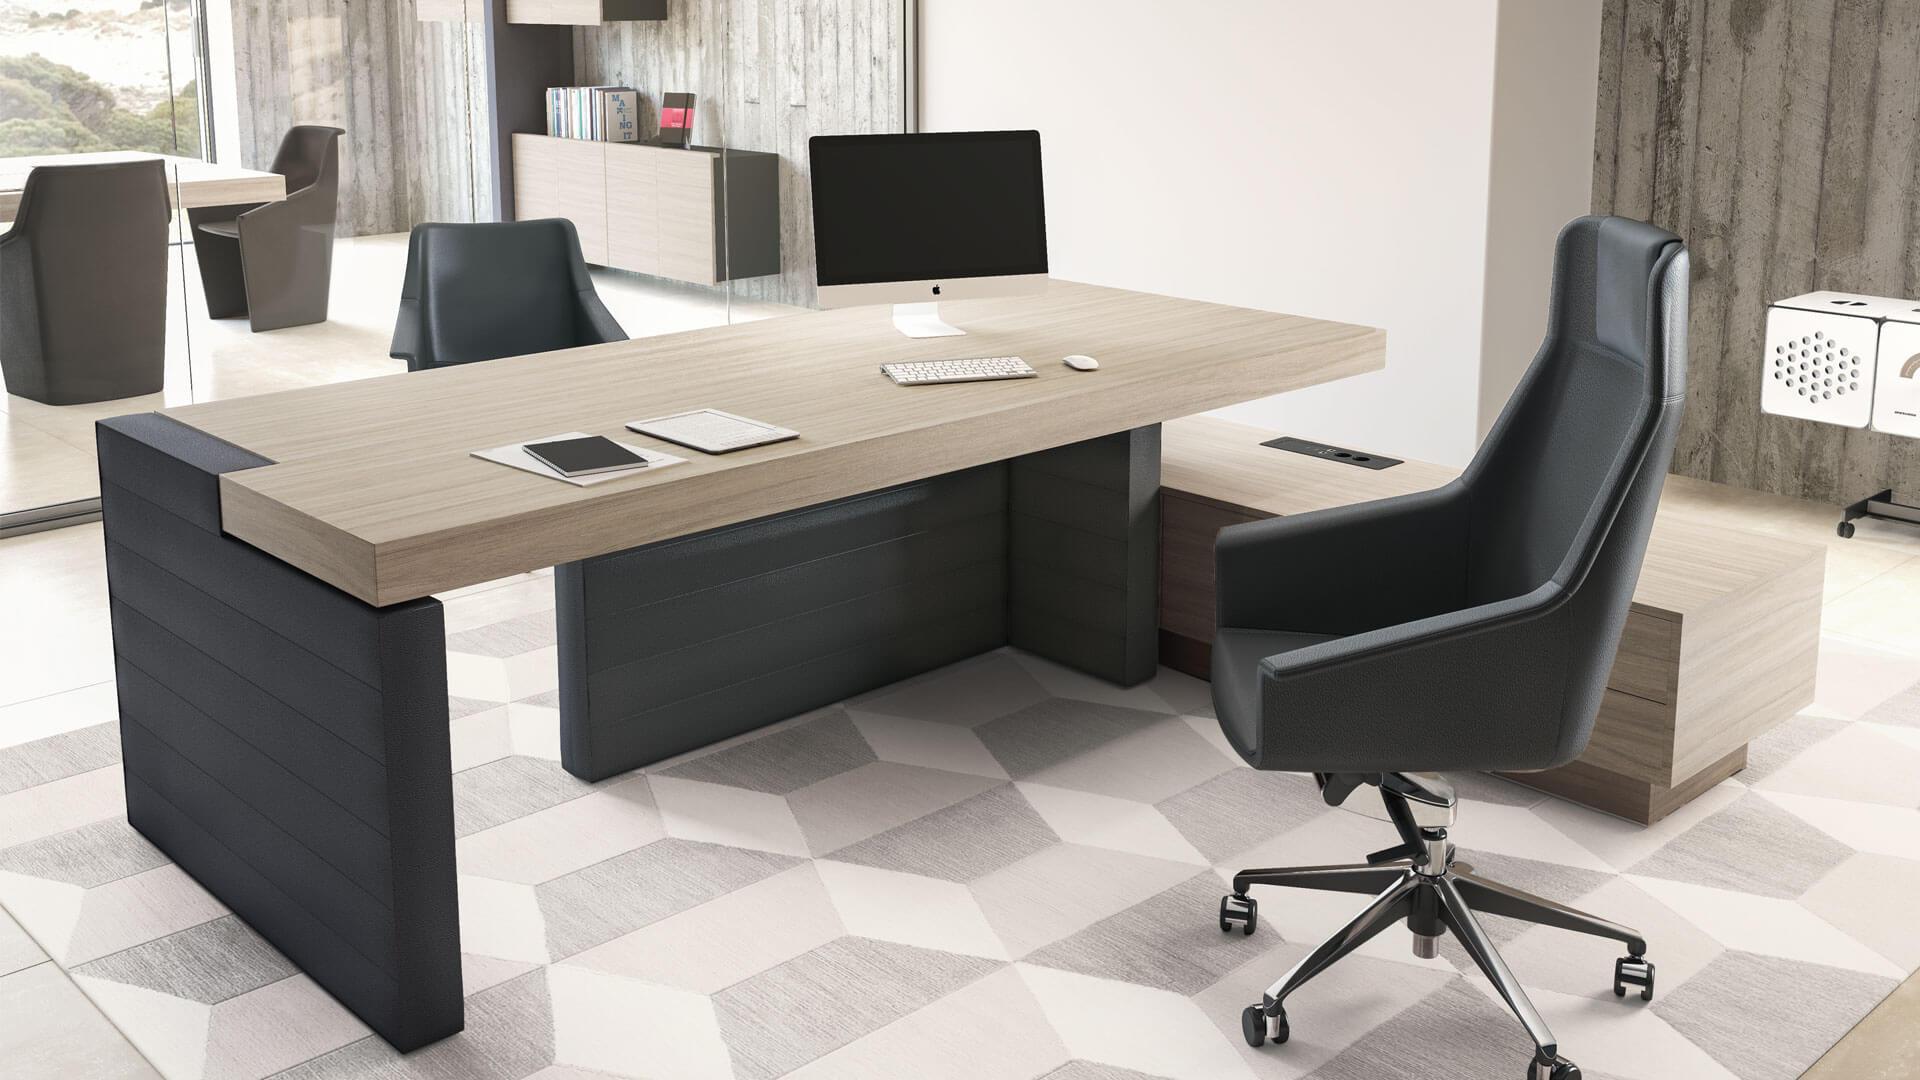 Las mobili jera kornak meble biurowe aran acja i for Las mobili ufficio